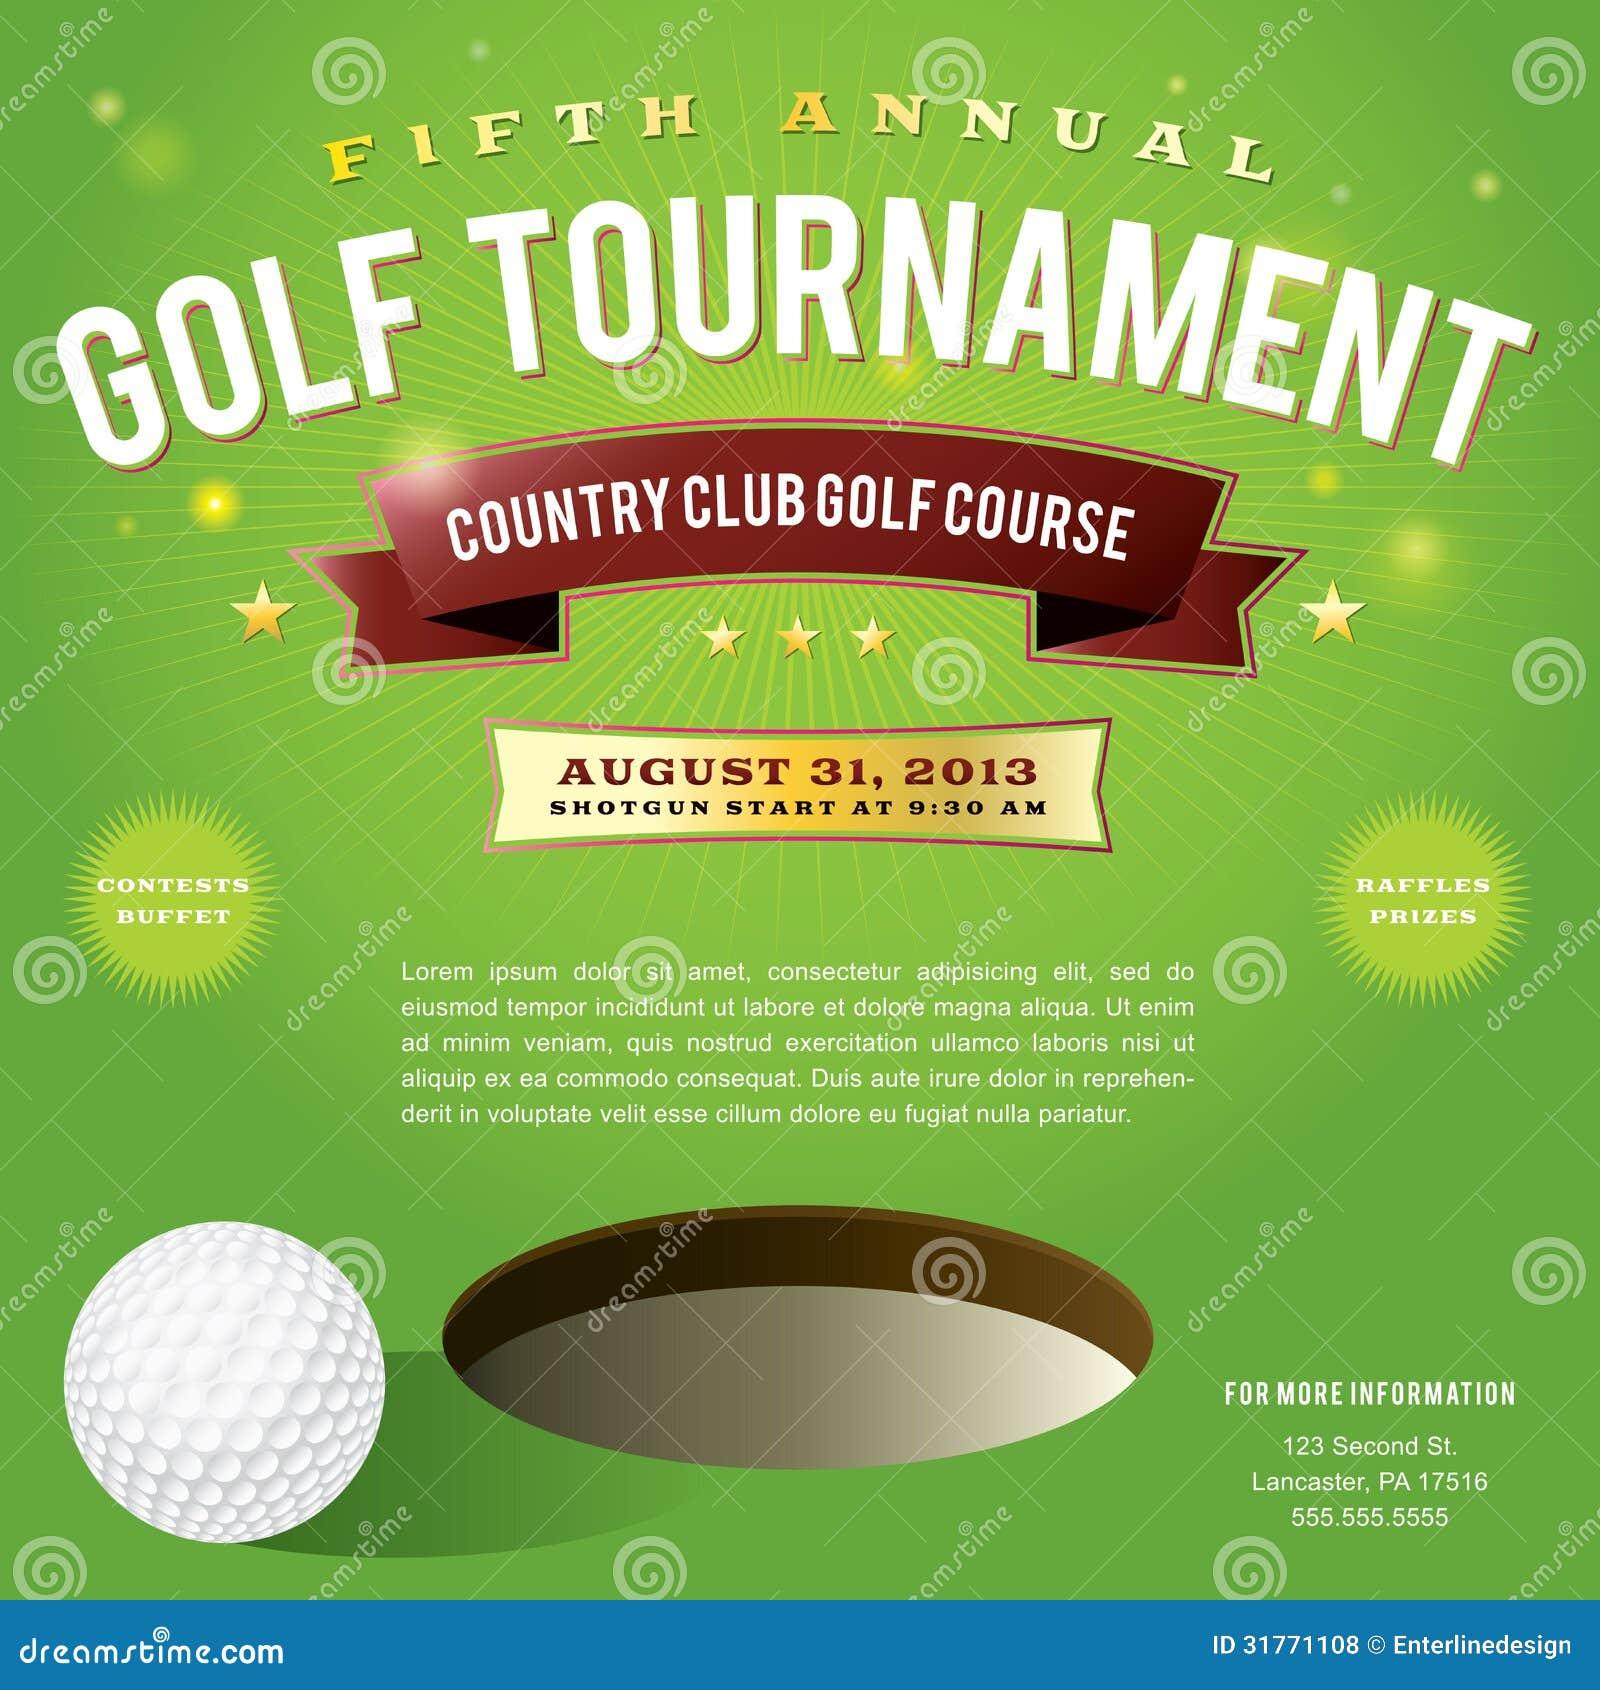 golf tournament invitation design royalty free stock photos image 31771108. Black Bedroom Furniture Sets. Home Design Ideas